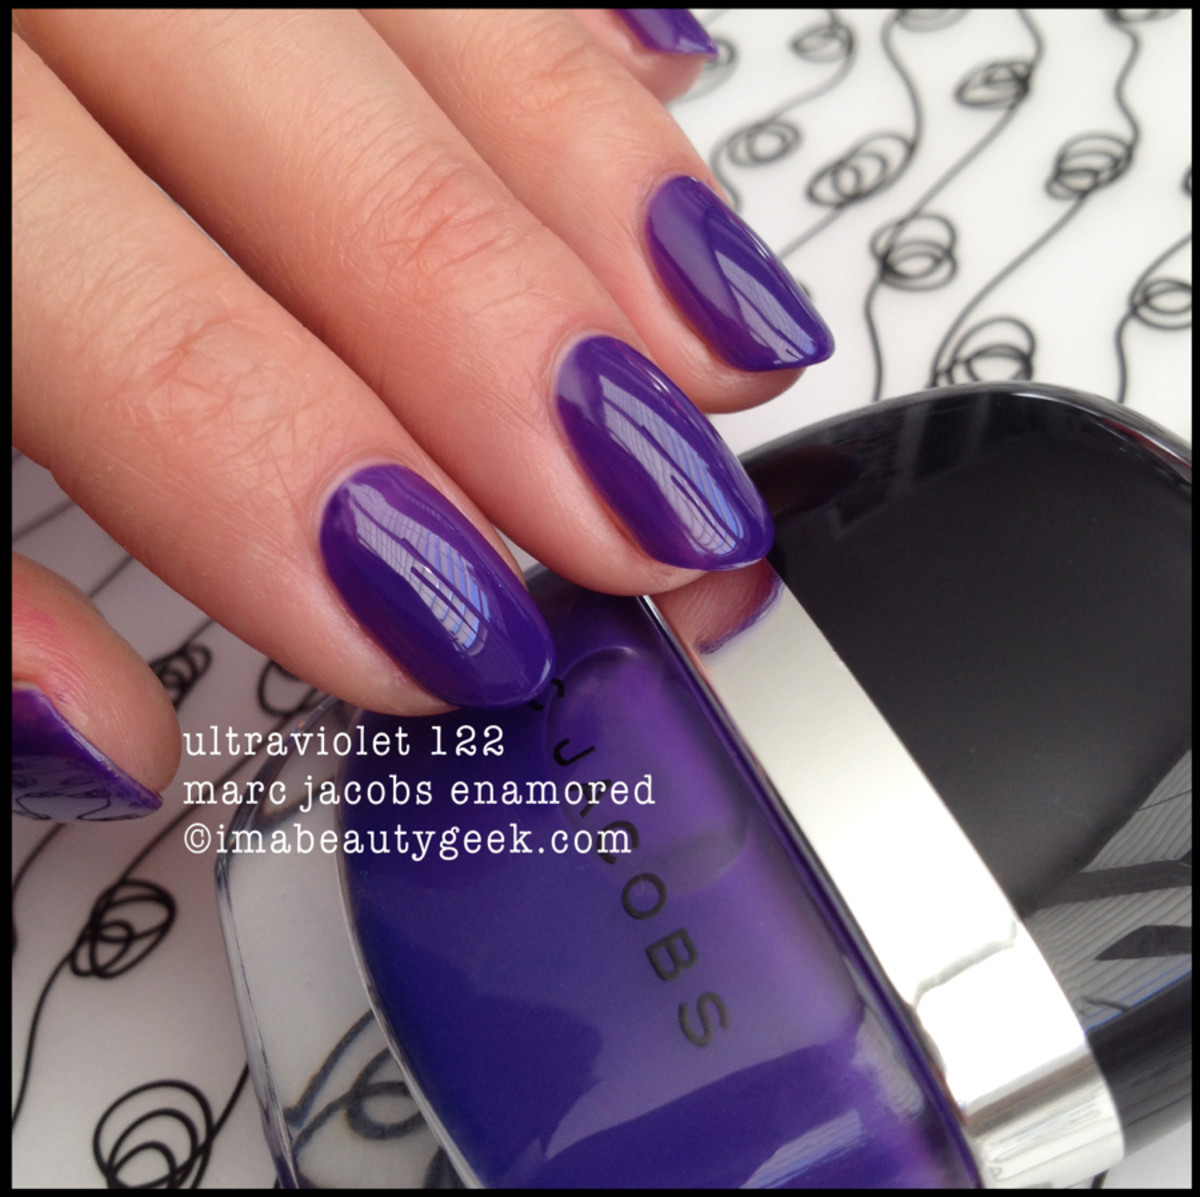 Marc Jacobs Ultraviolet 122 Enamored Nail Polish